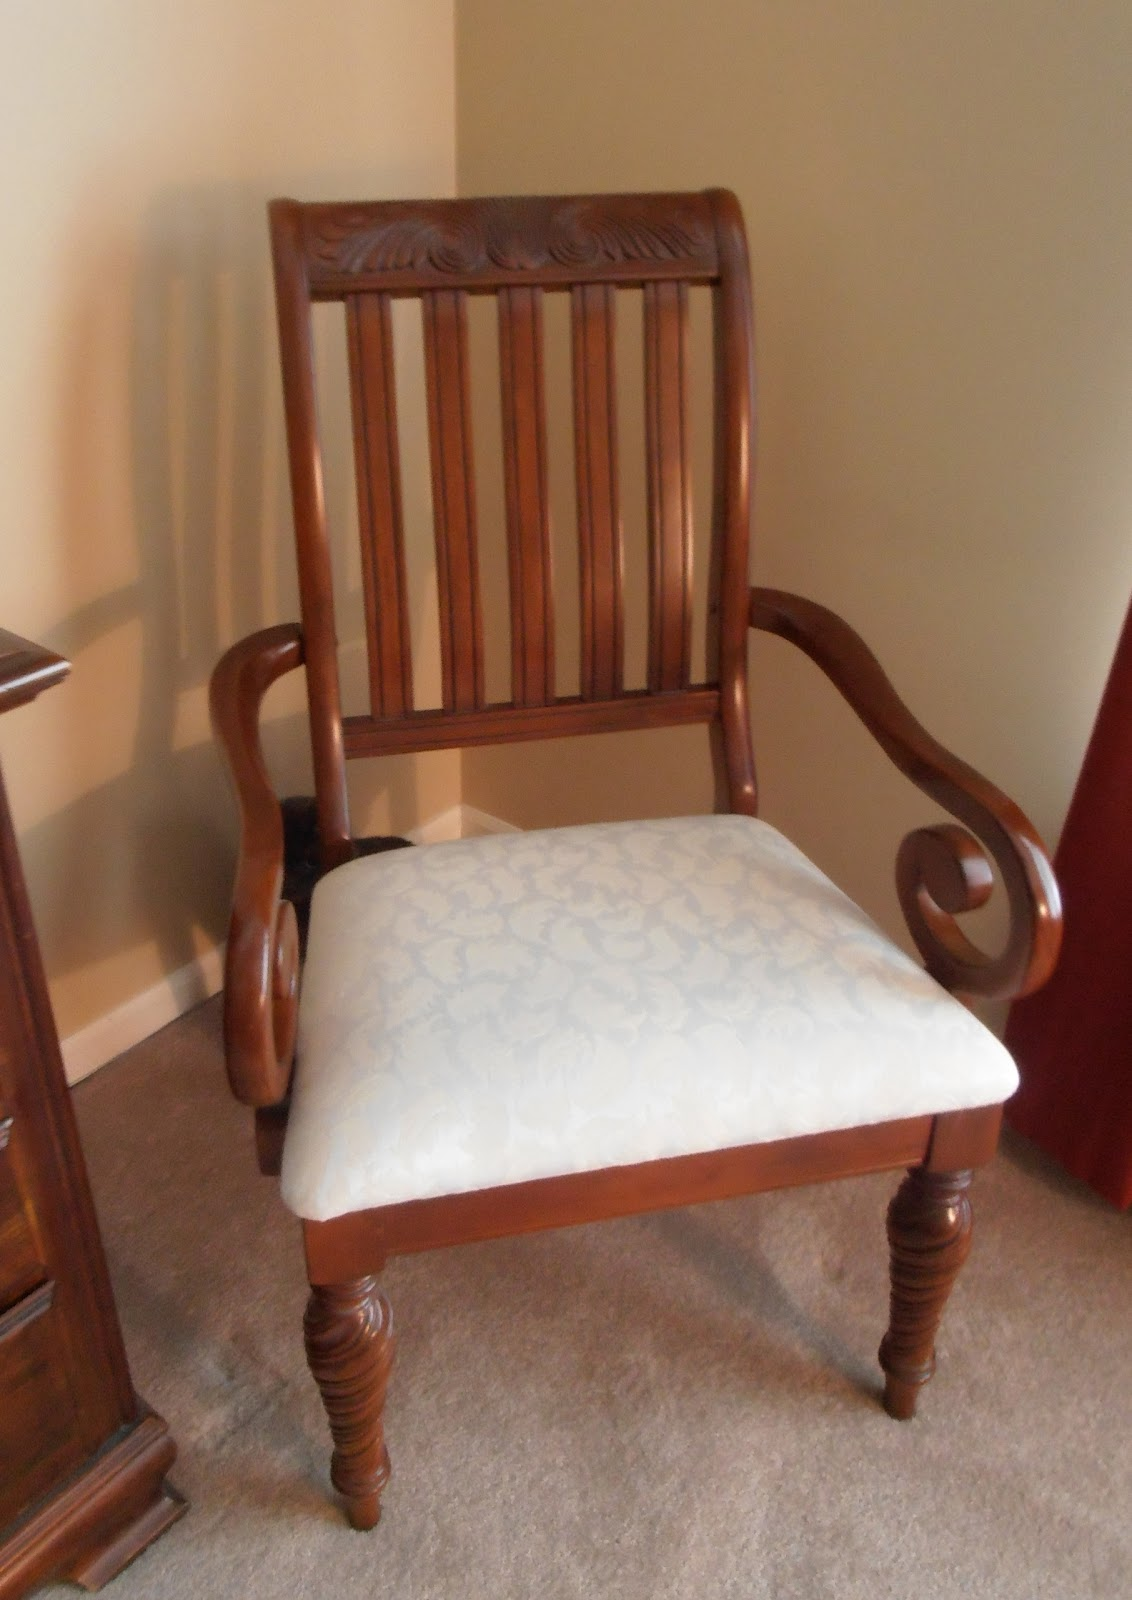 Tallgrass Design: Chair Migration